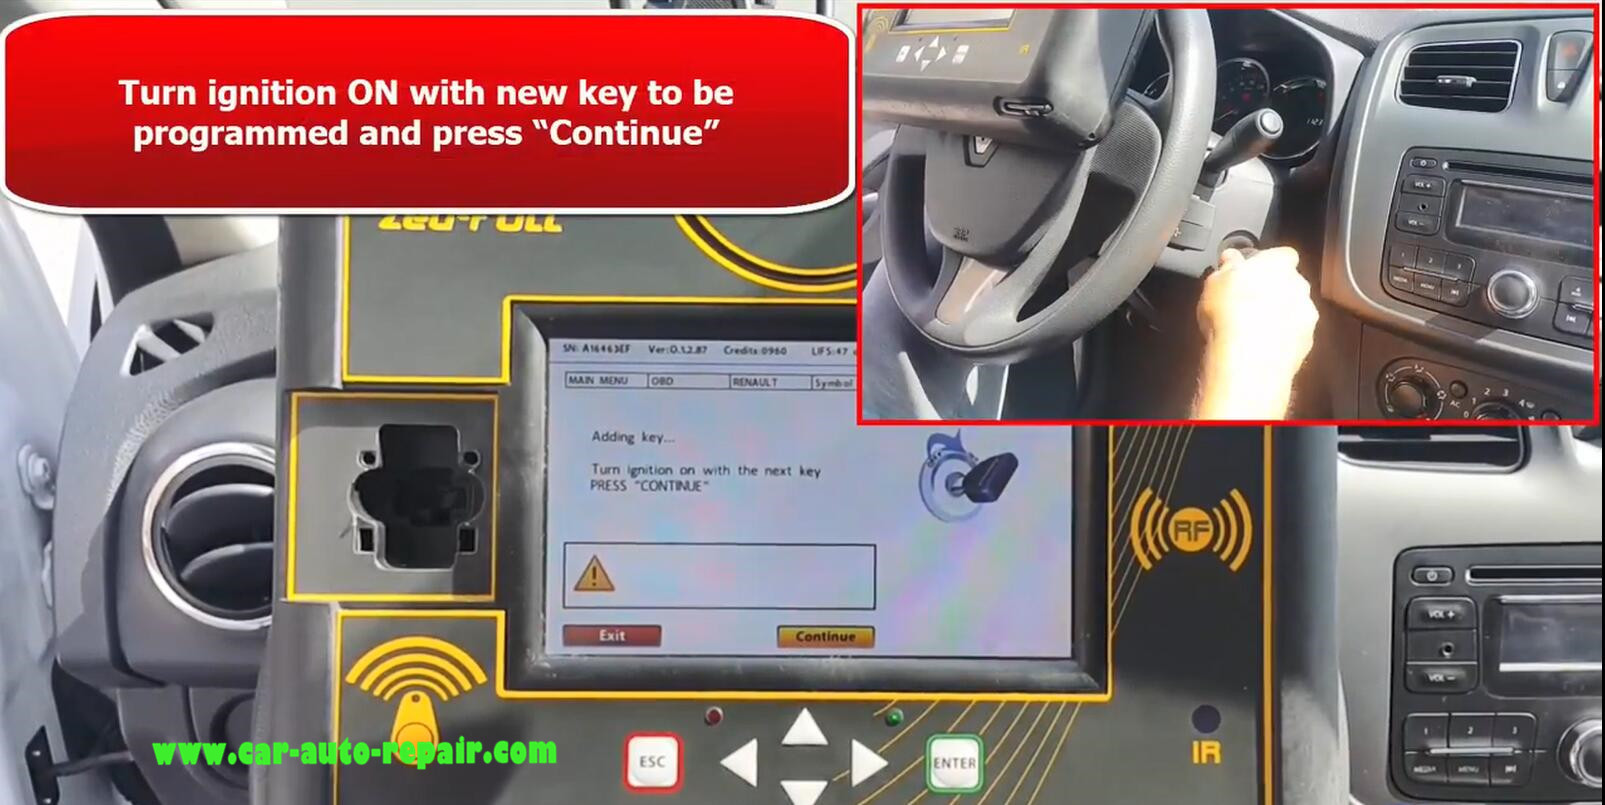 Renault SYMBOL 13+ Key Programming by Zed-Full Programmer (11)